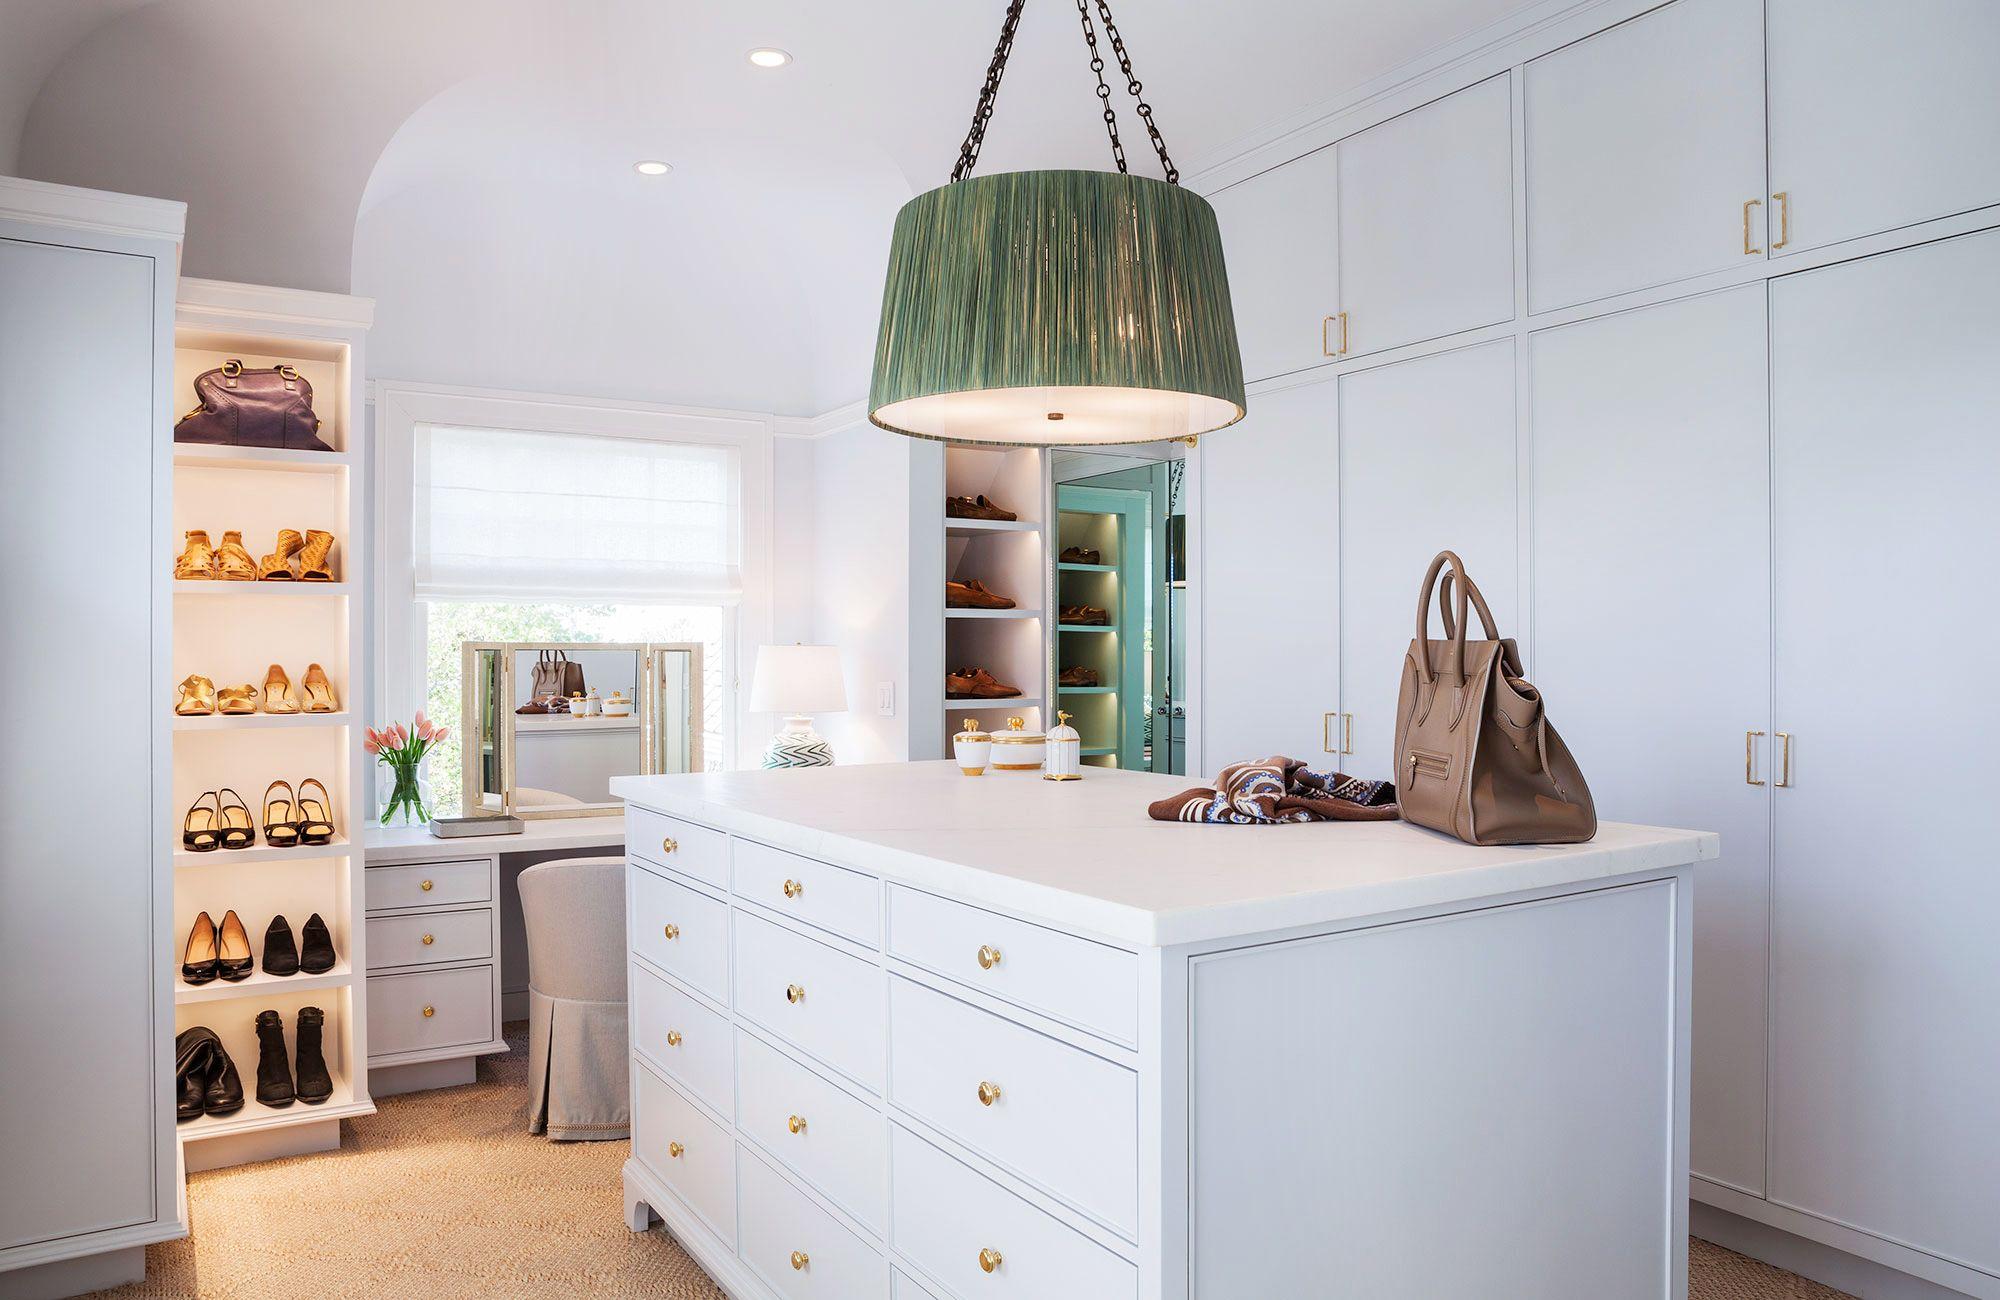 34 Best Closet Organization Ideas How To Organize Your Closet